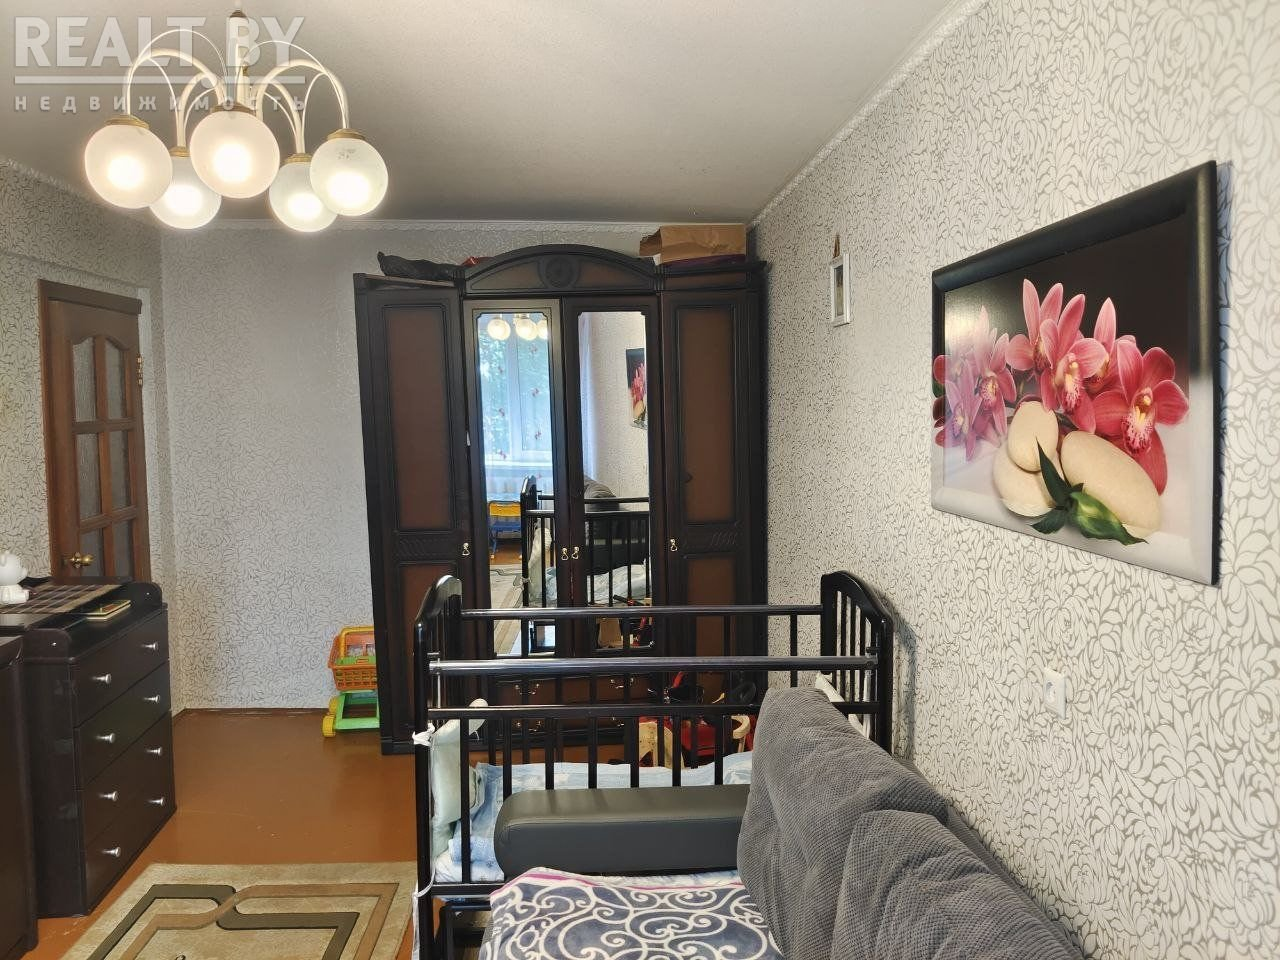 Продается 3-х комнатная квартира, Витебск - фото №2